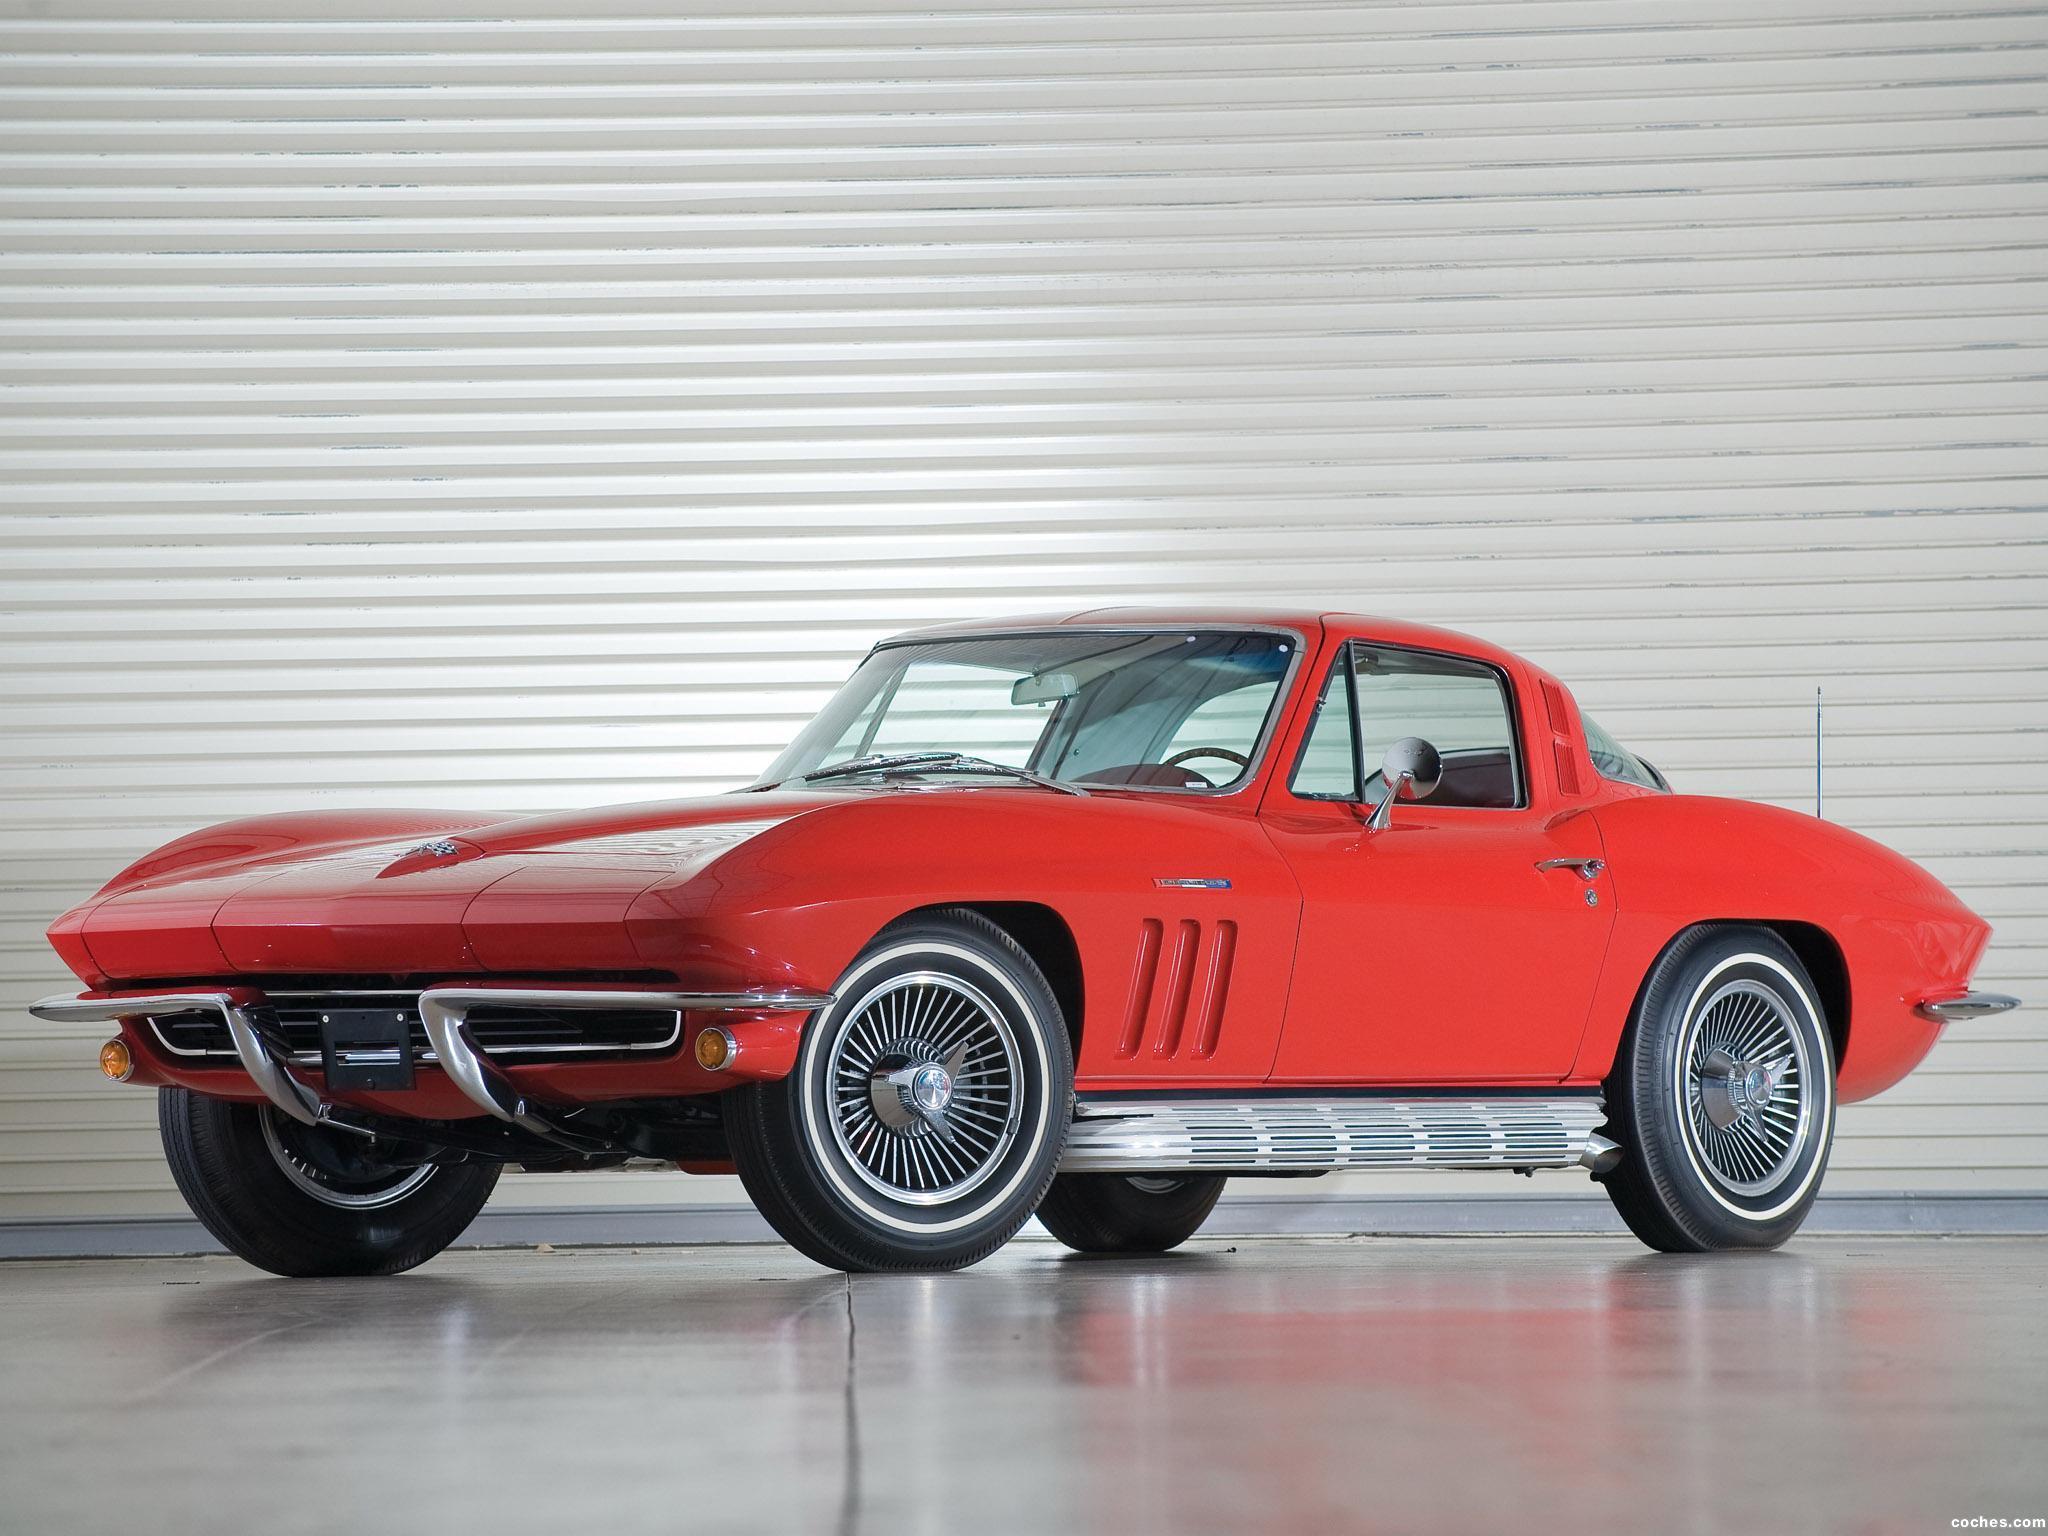 Foto 0 de Chevrolet Corvette C2 Sting Ray 327 L84 1965